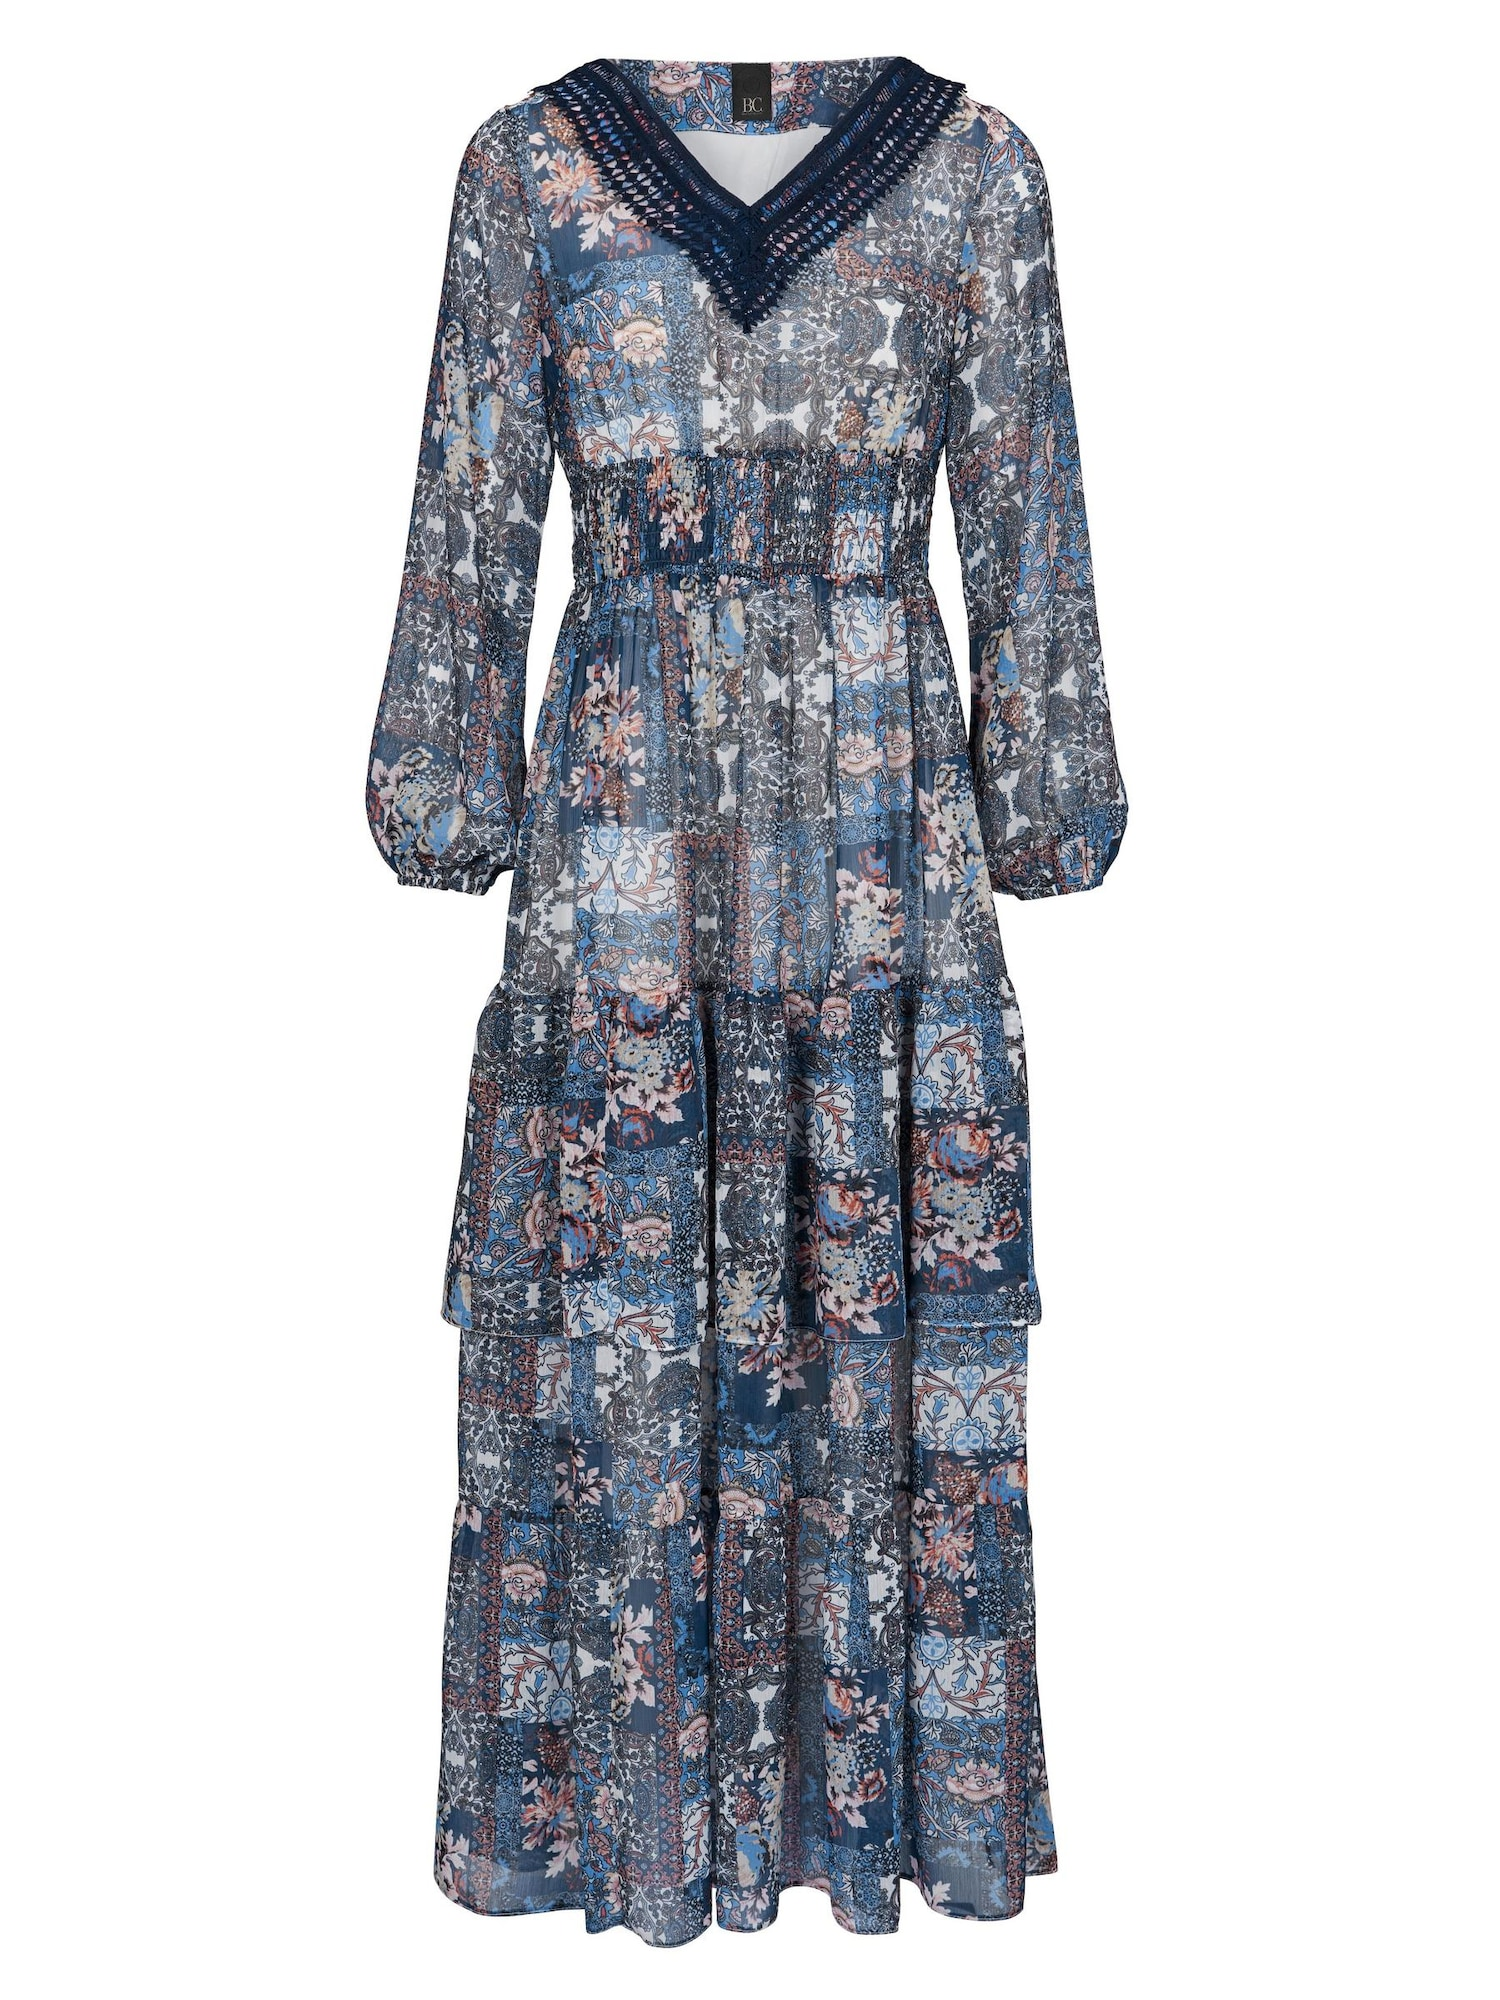 Šaty modrá mix barev Heine